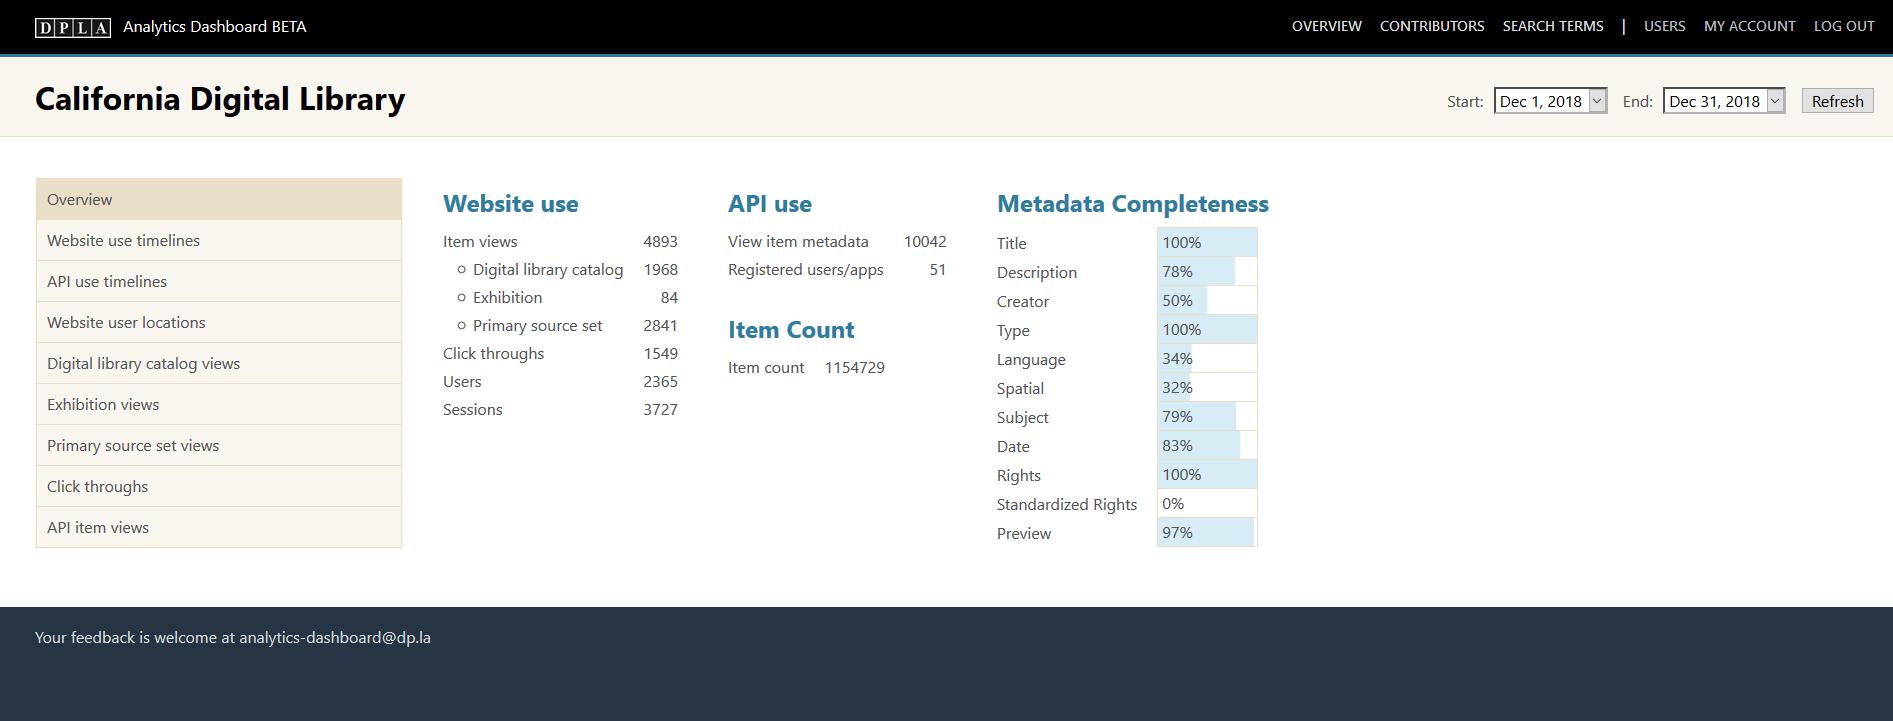 DPLA Analytics Dashboard screenshot